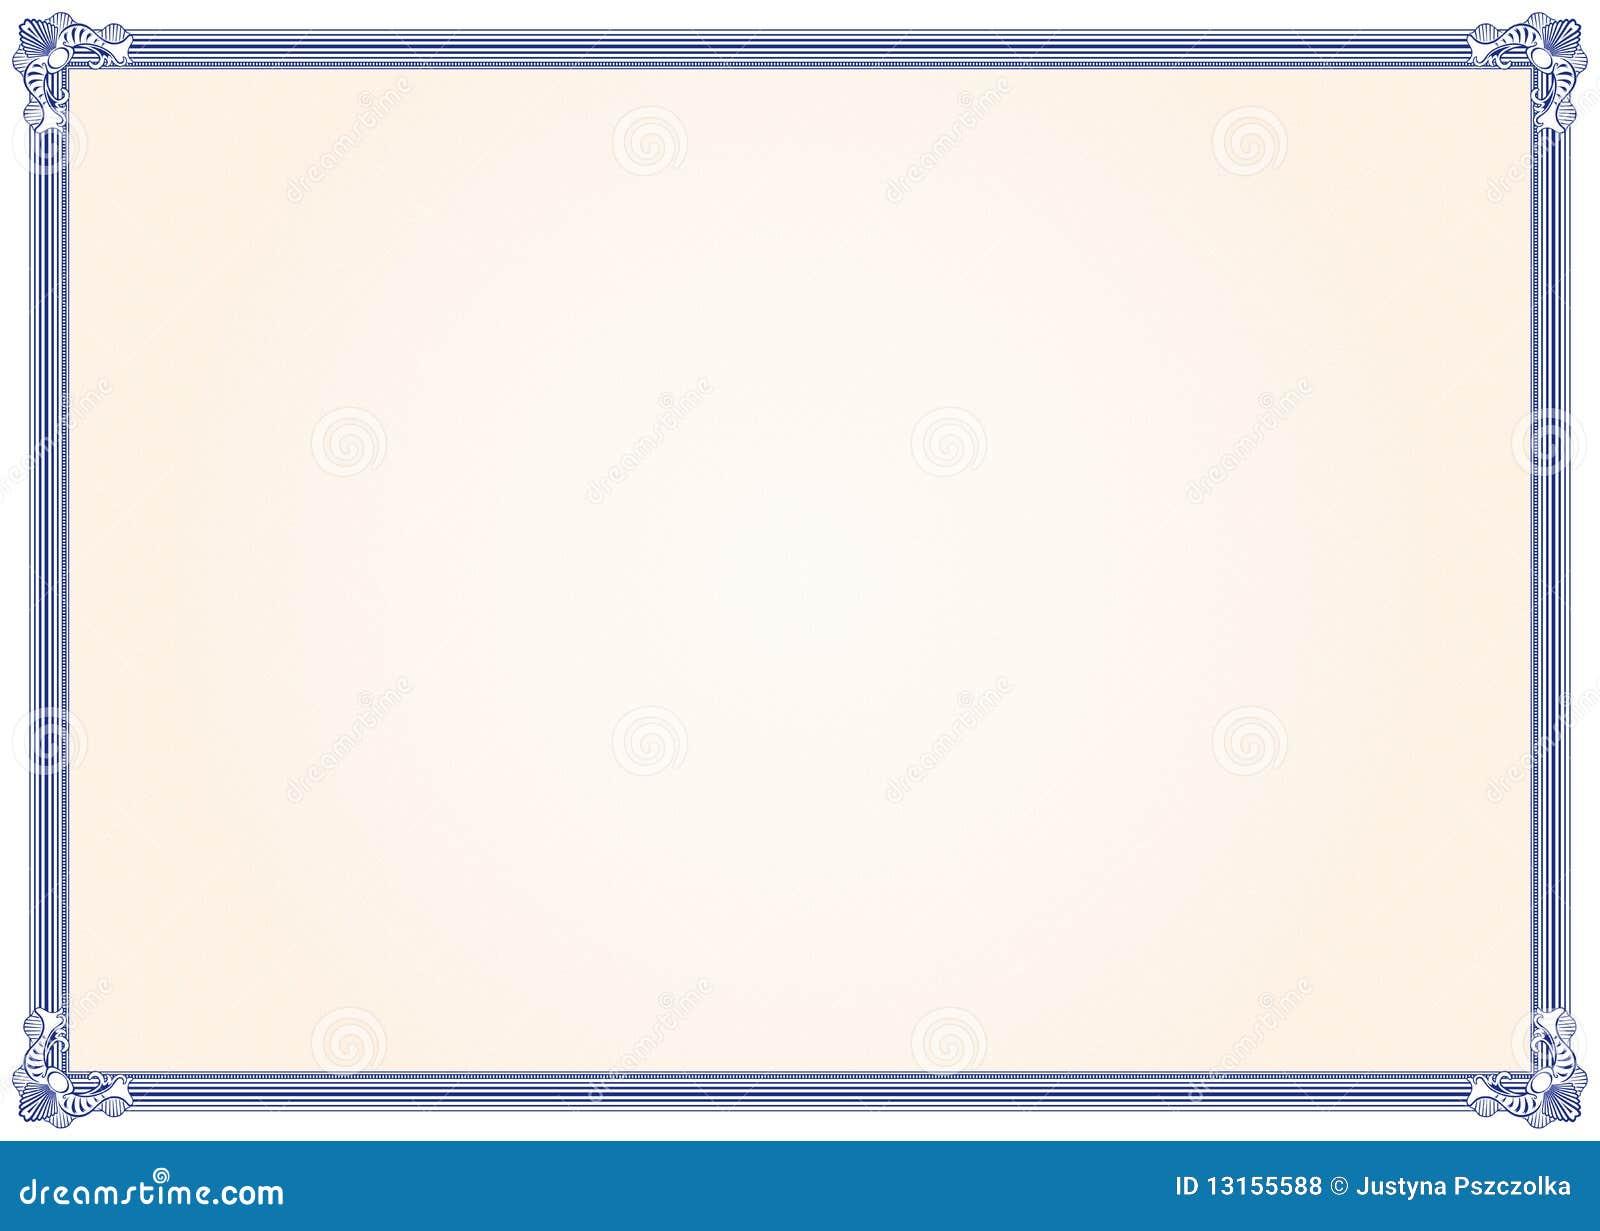 Рамка guilloche для сертификата диплома или кредитки Иллюстрация  рамка диплома Стоковые Фотографии rf